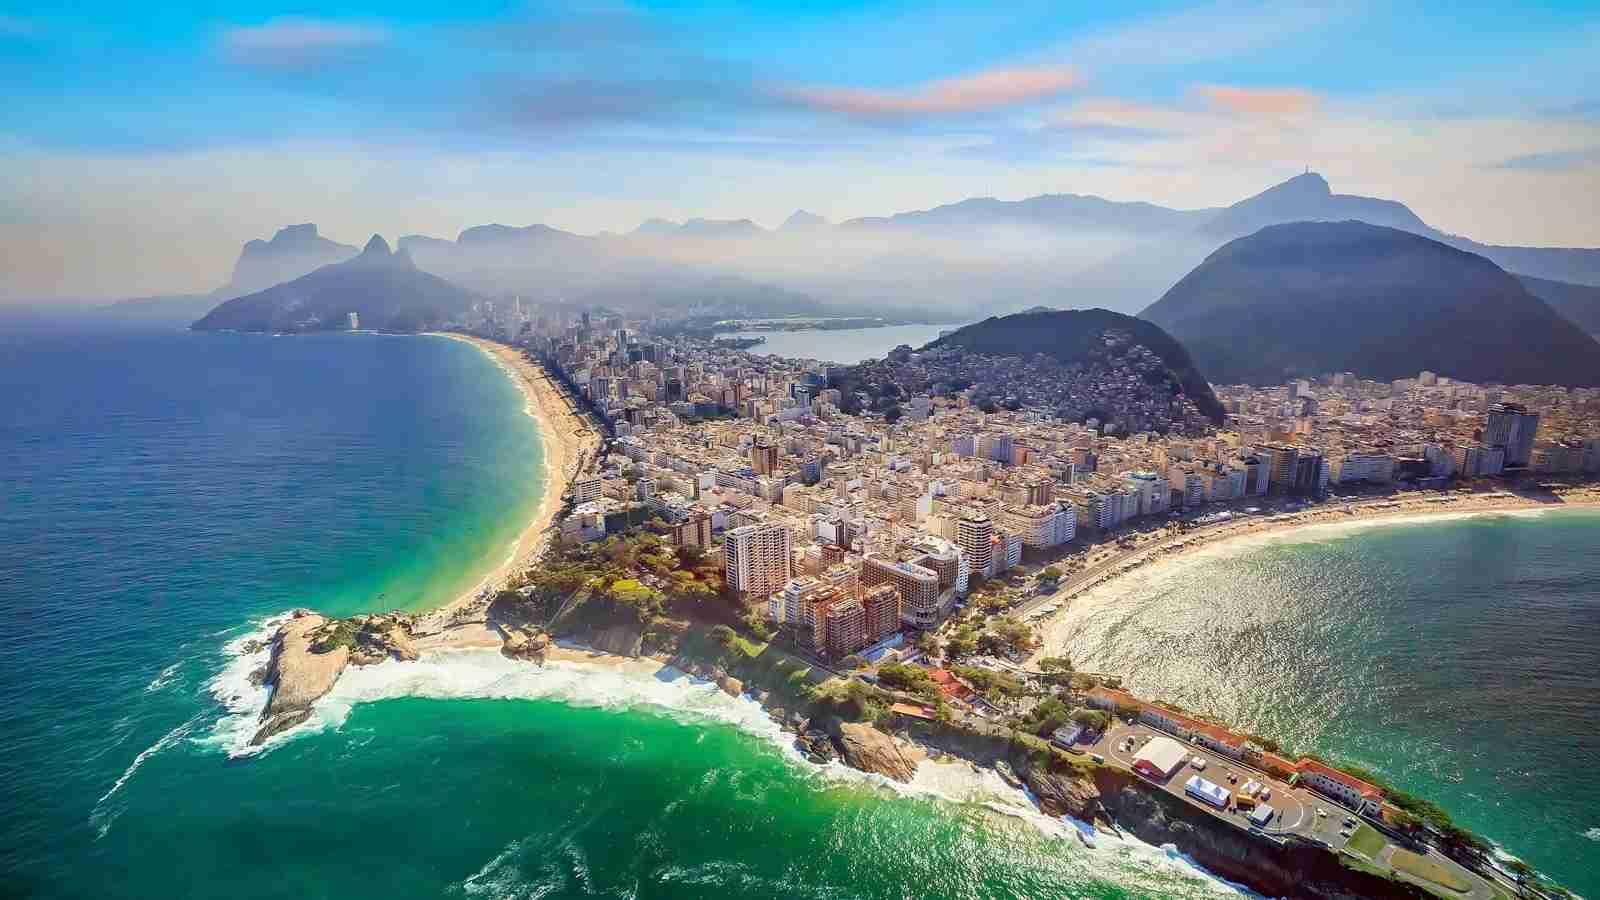 Copacabana Beach and Ipanema beach in Rio de Janeiro. (Photo by f11photo/Getty Images)